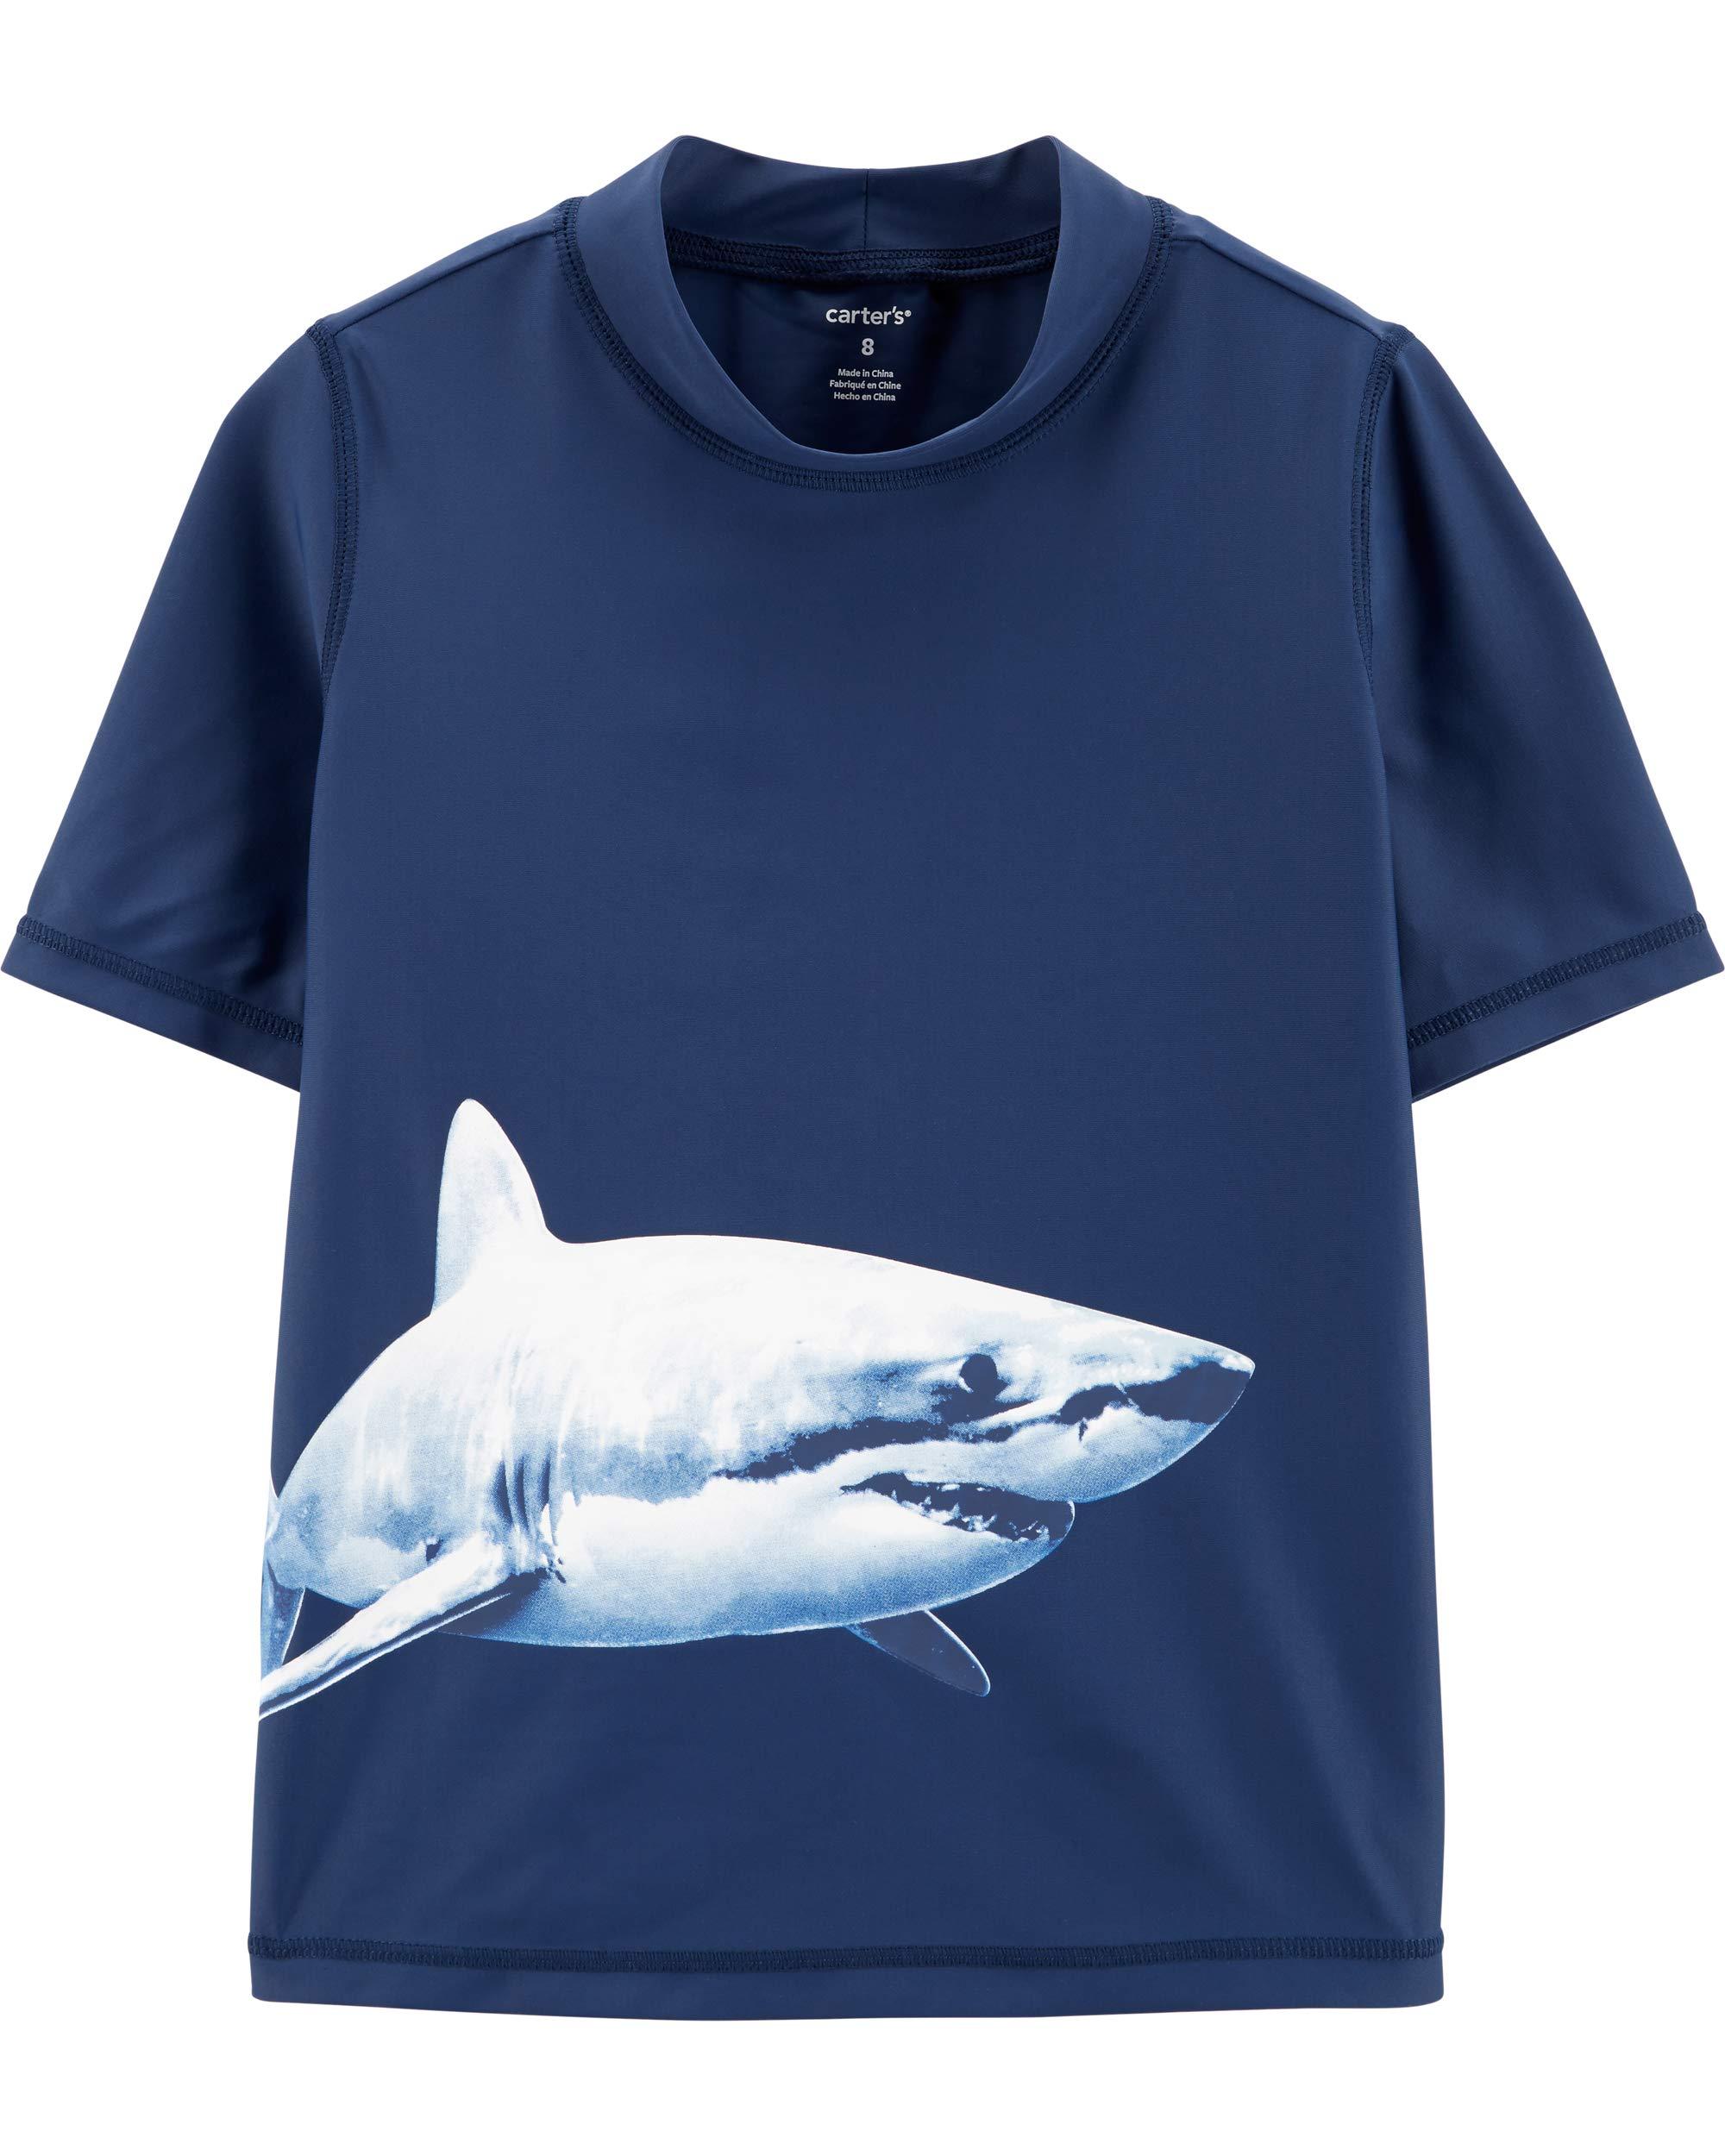 Carter's Little Boys' Rashguard, Blue Sharks, 6